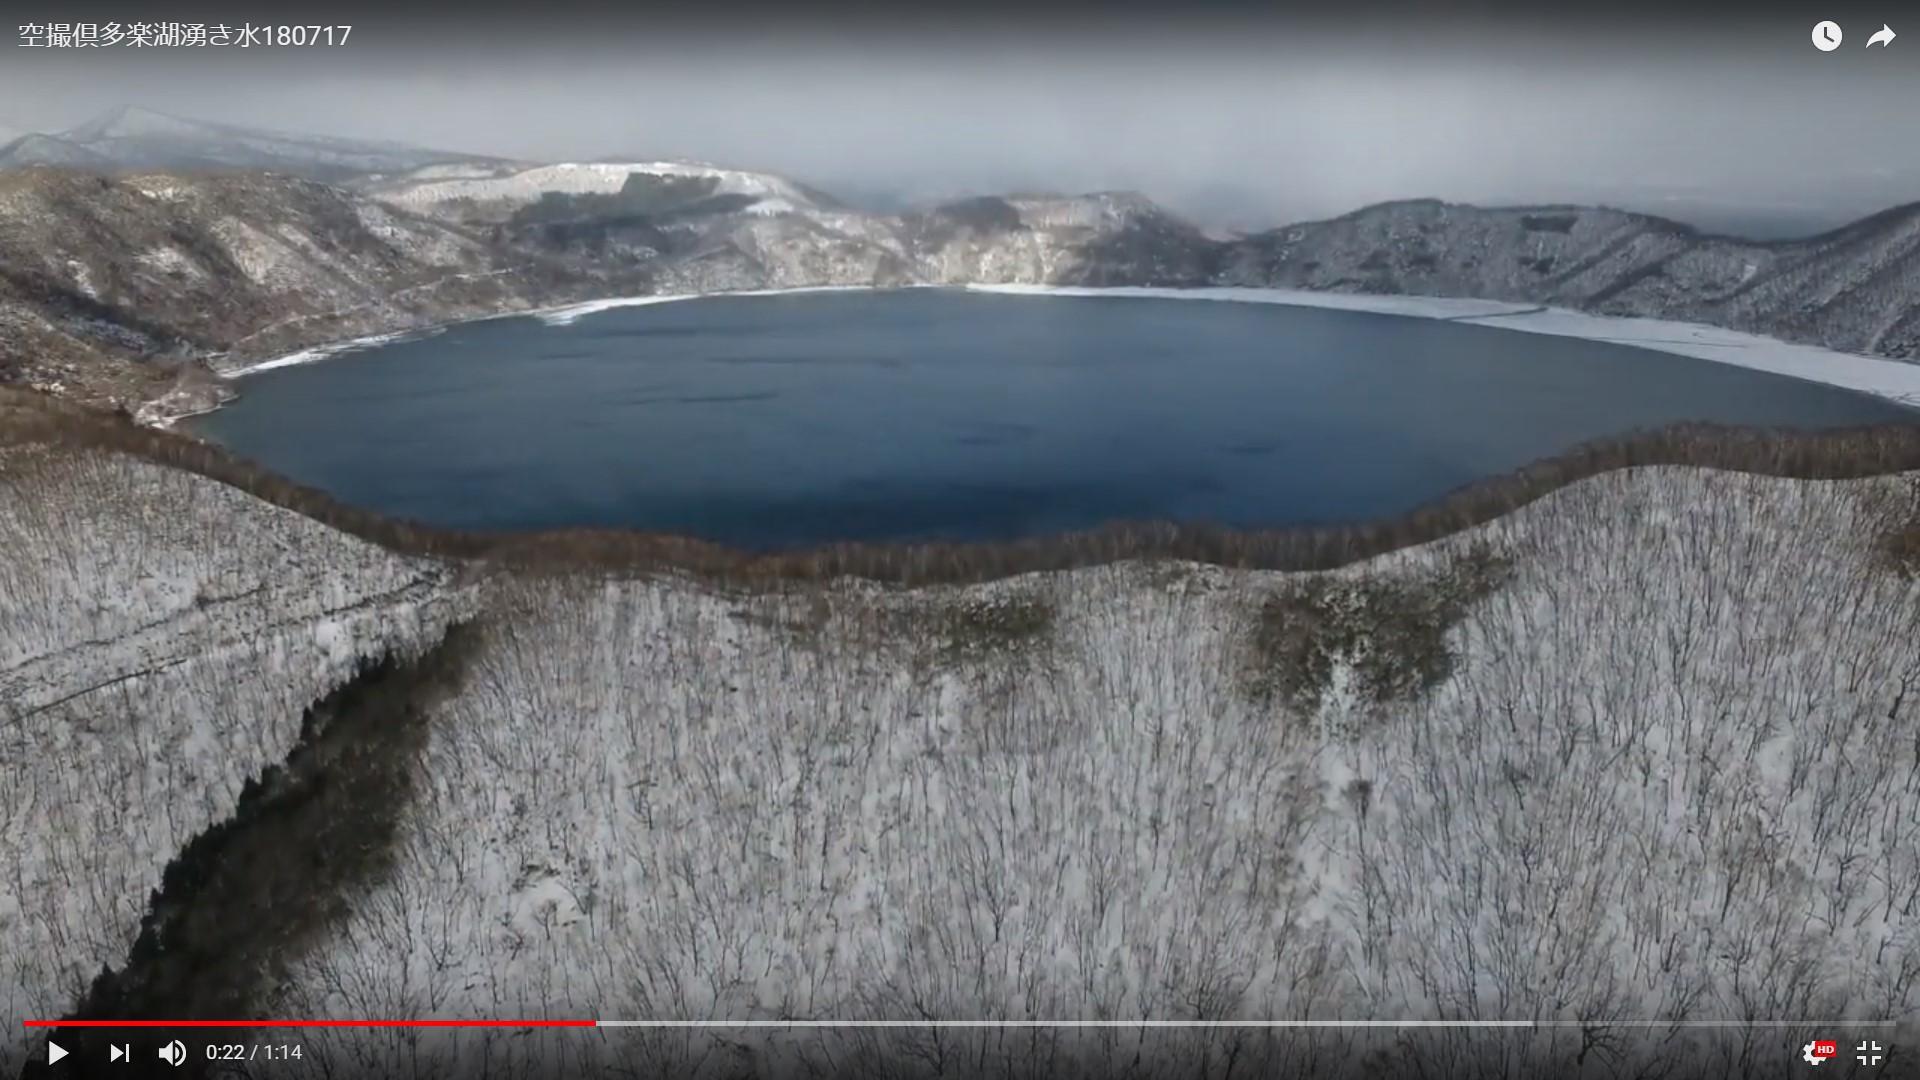 Volcano_lake (2)